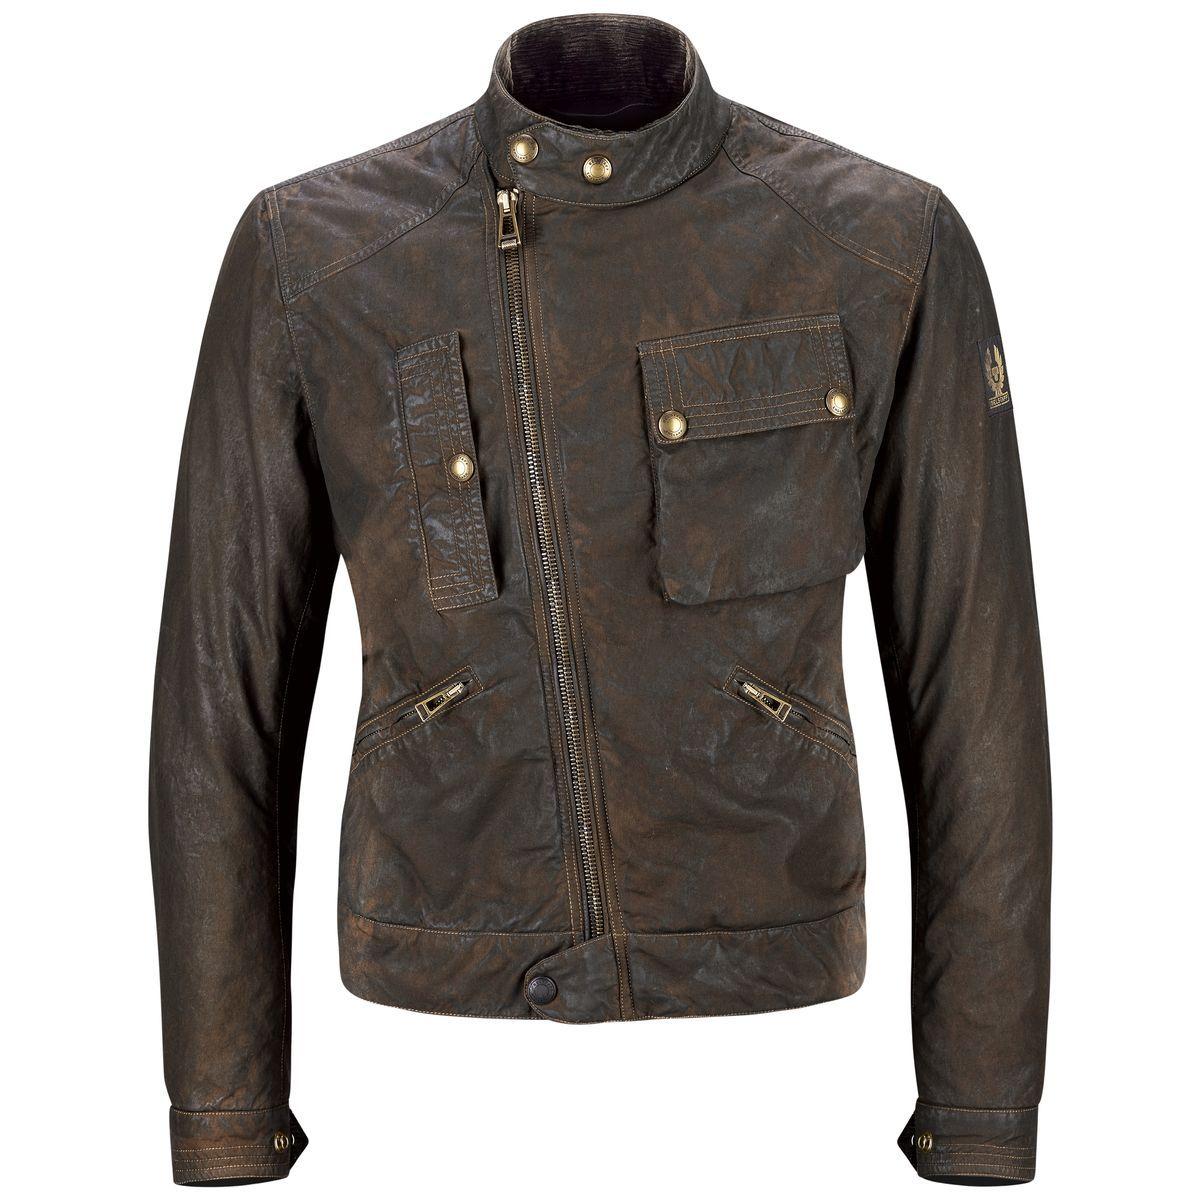 Belstaff Imperial Jacket